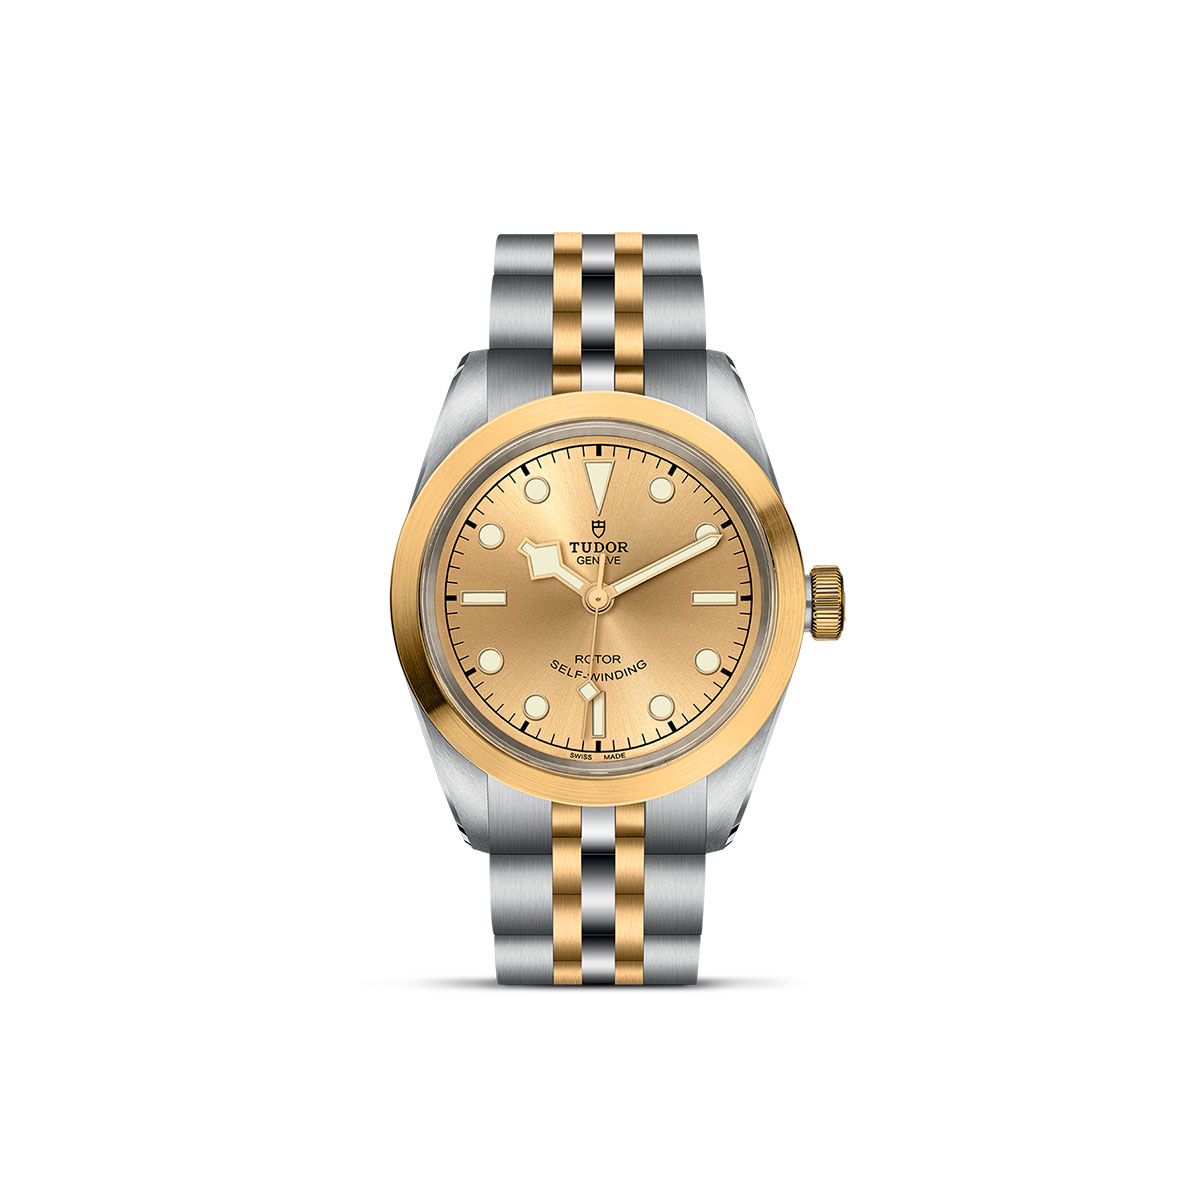 TUDOR Black Bay 32 S&G Watch